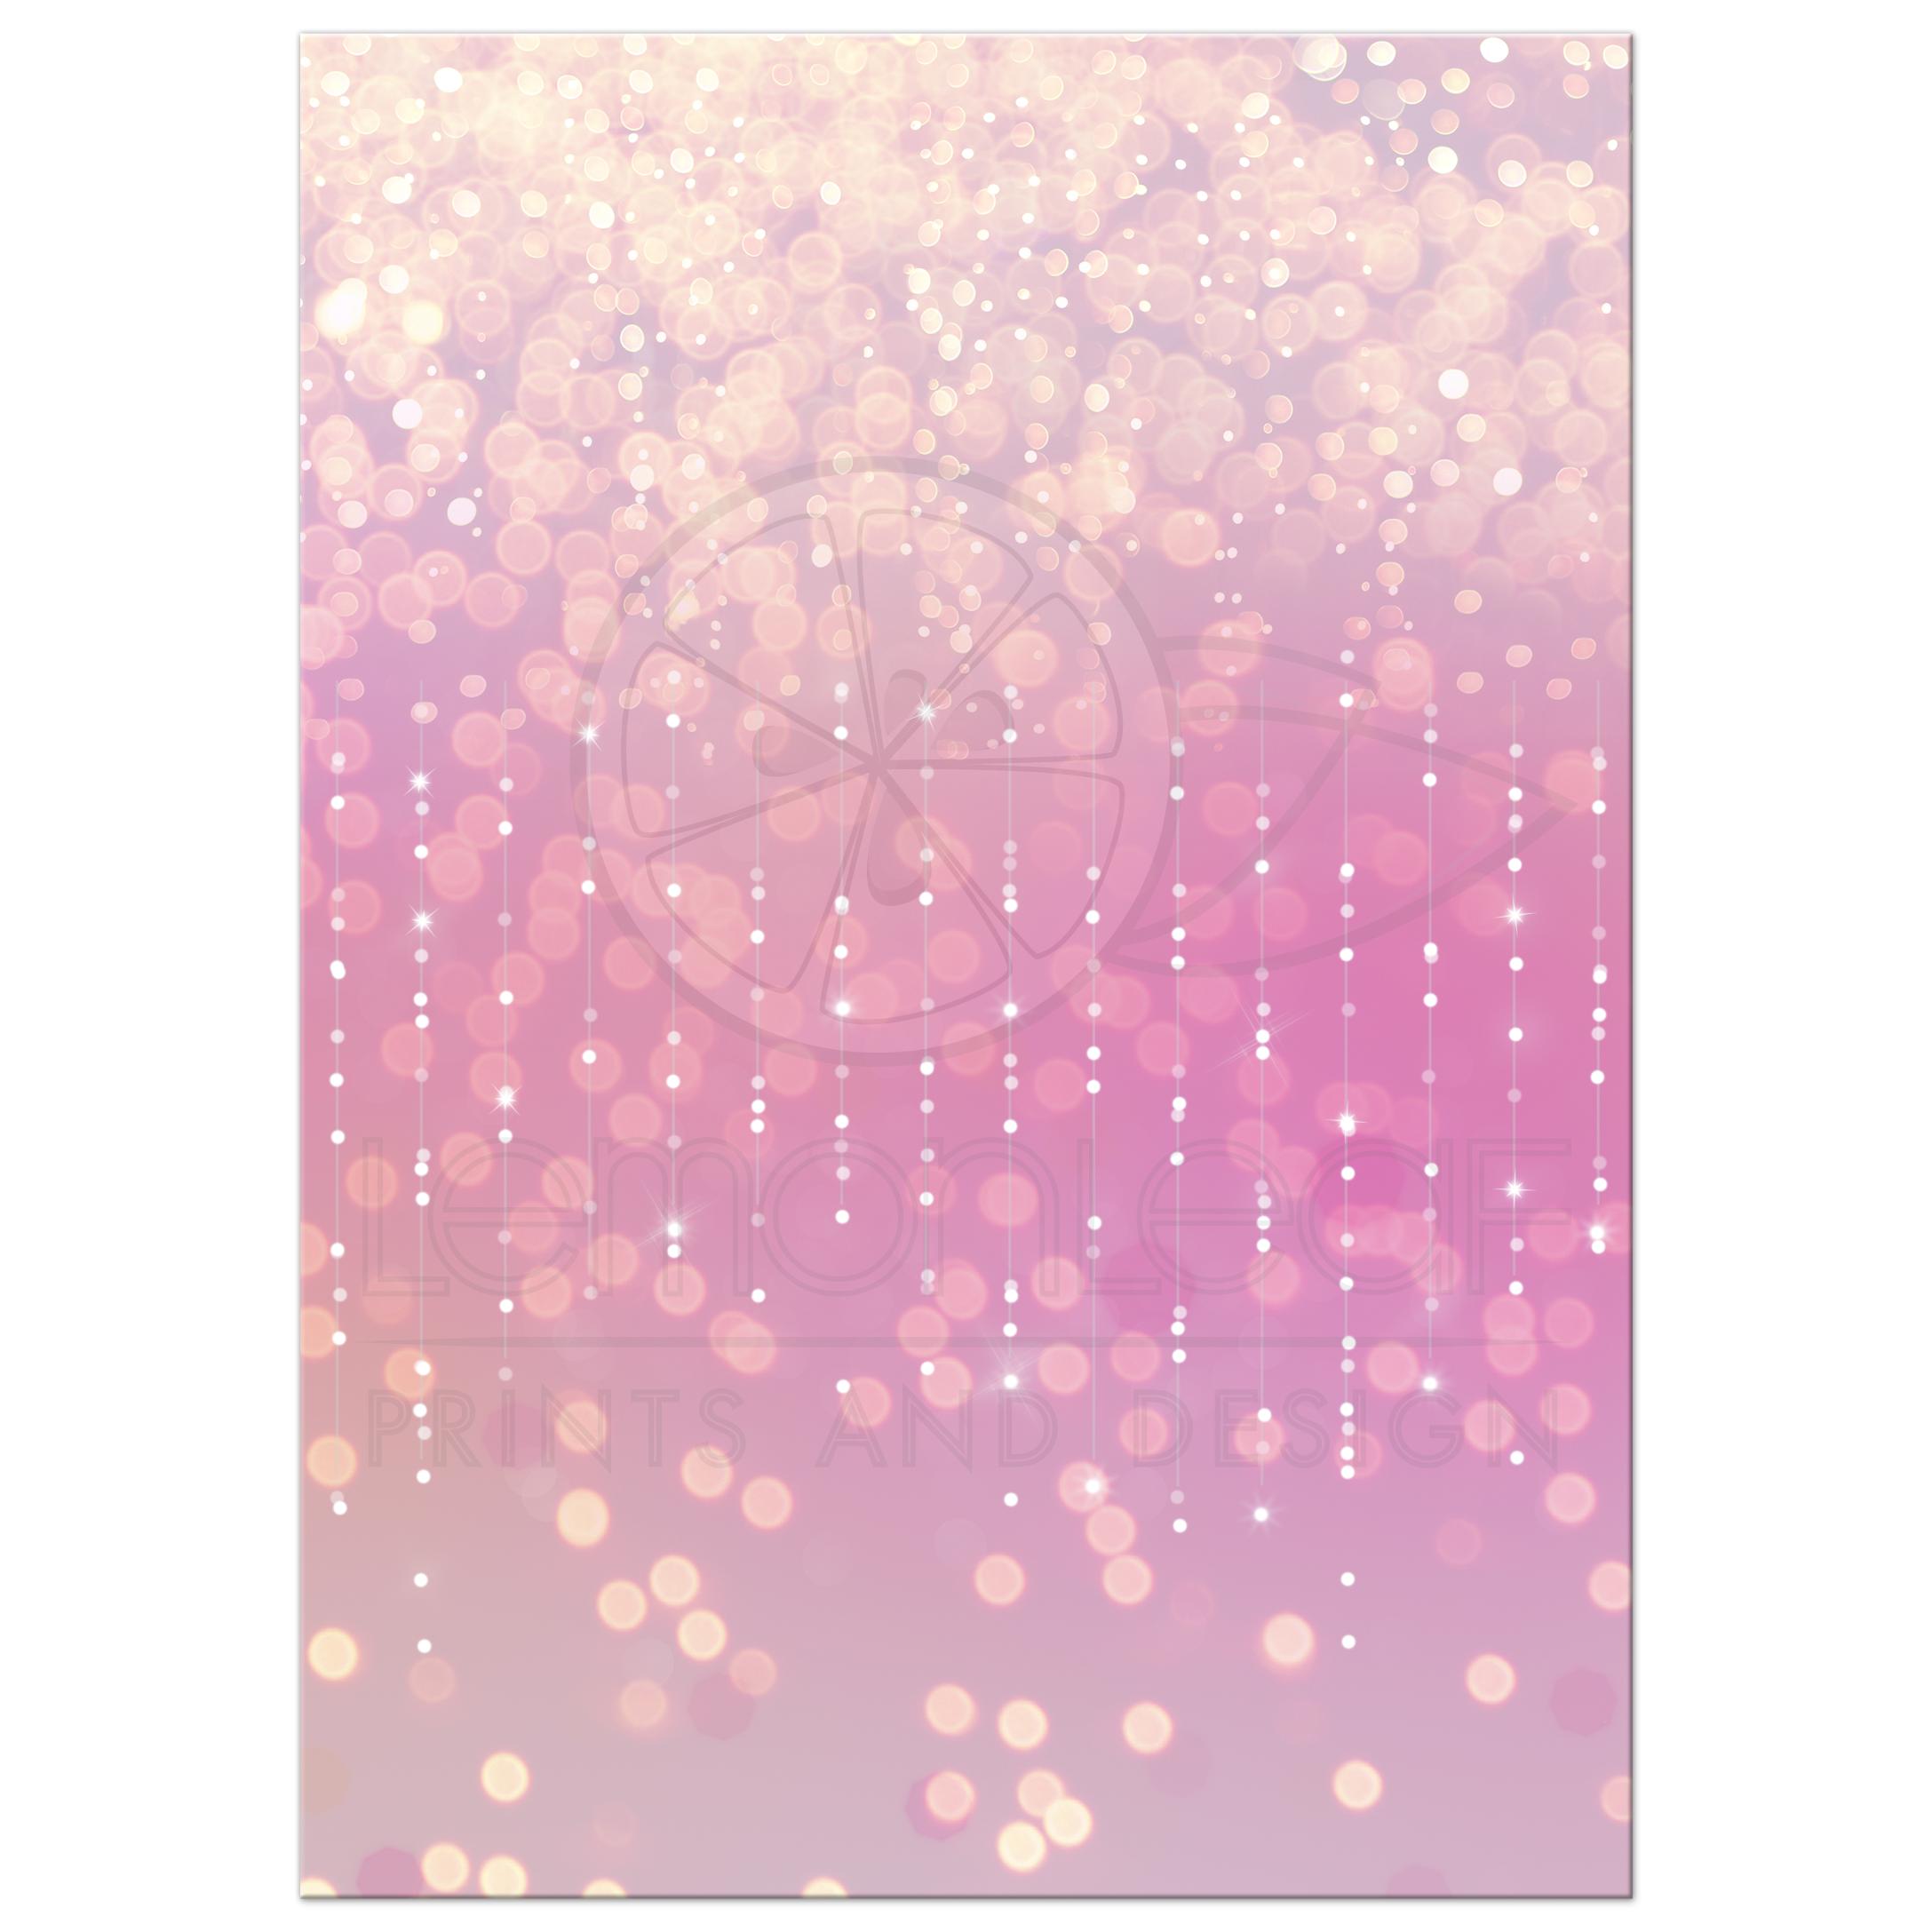 Bokeh Flowers Wedding: Pink And White Bat Mitzvah Invitation